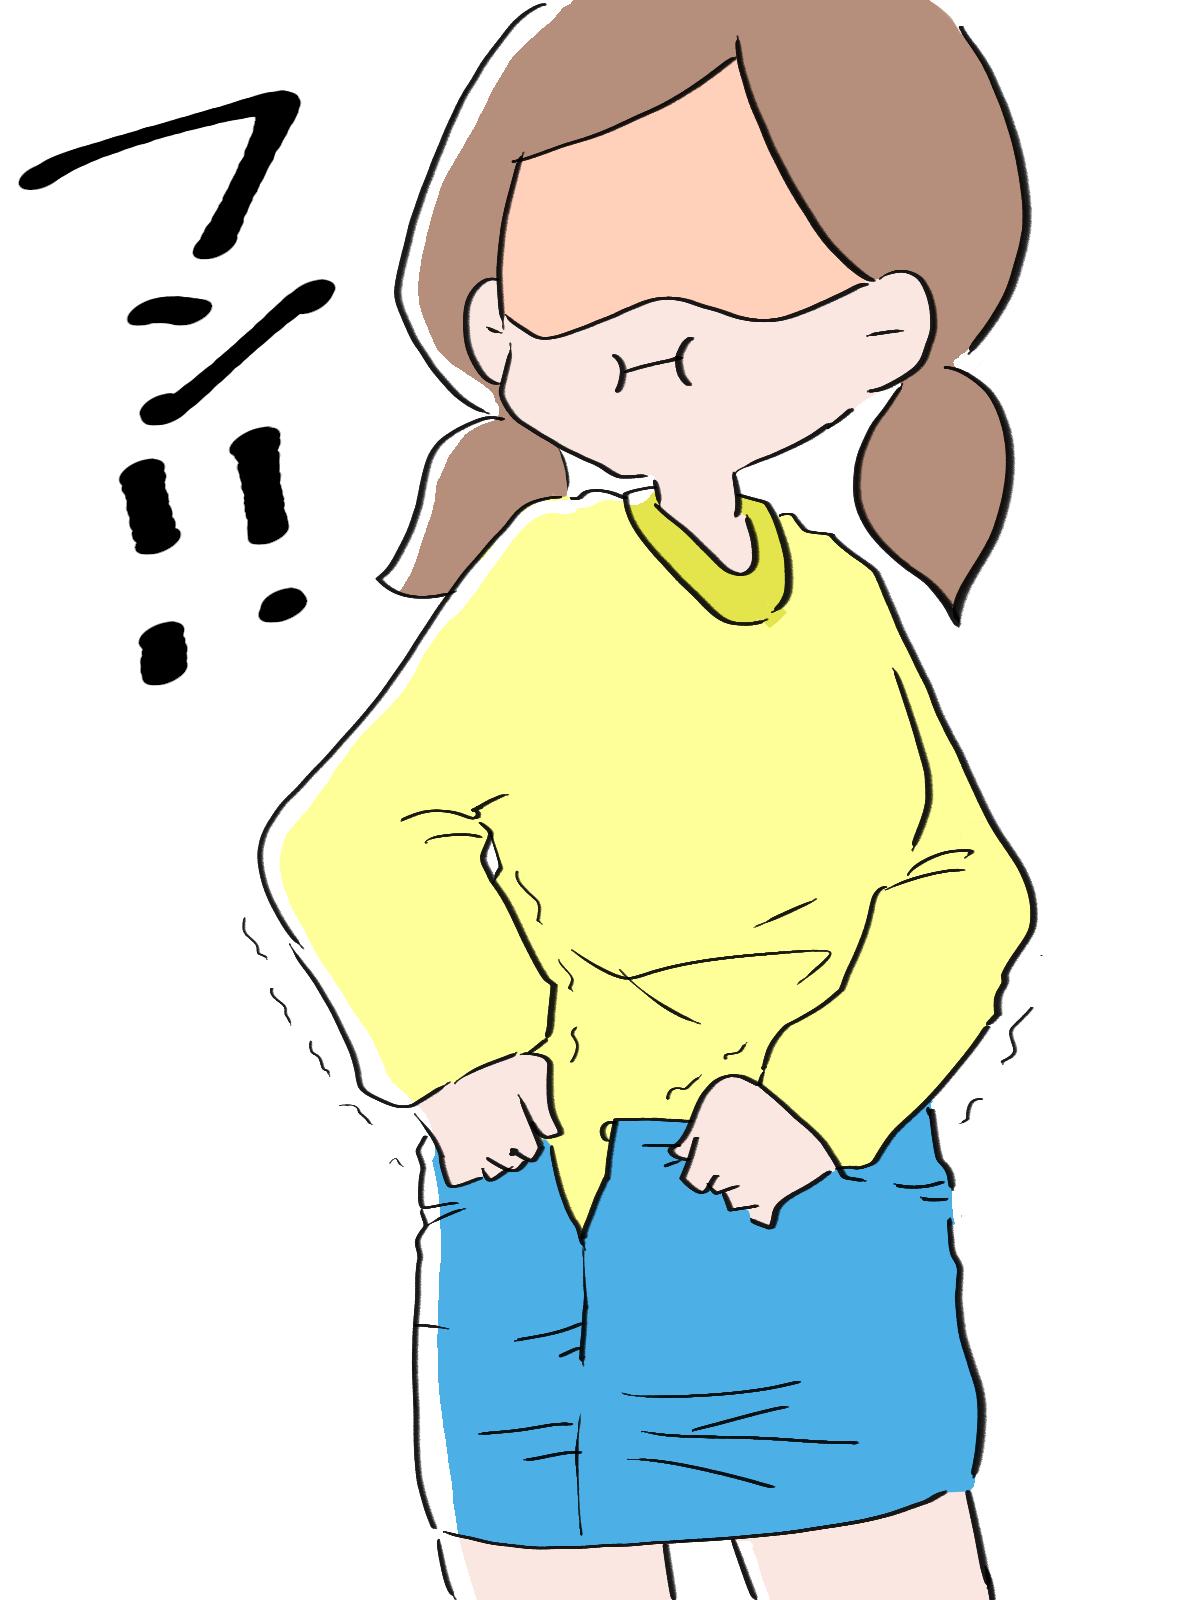 【Japanese Onomatopoeia】PICHI-PICHI / ぴちぴち / ピチピチ